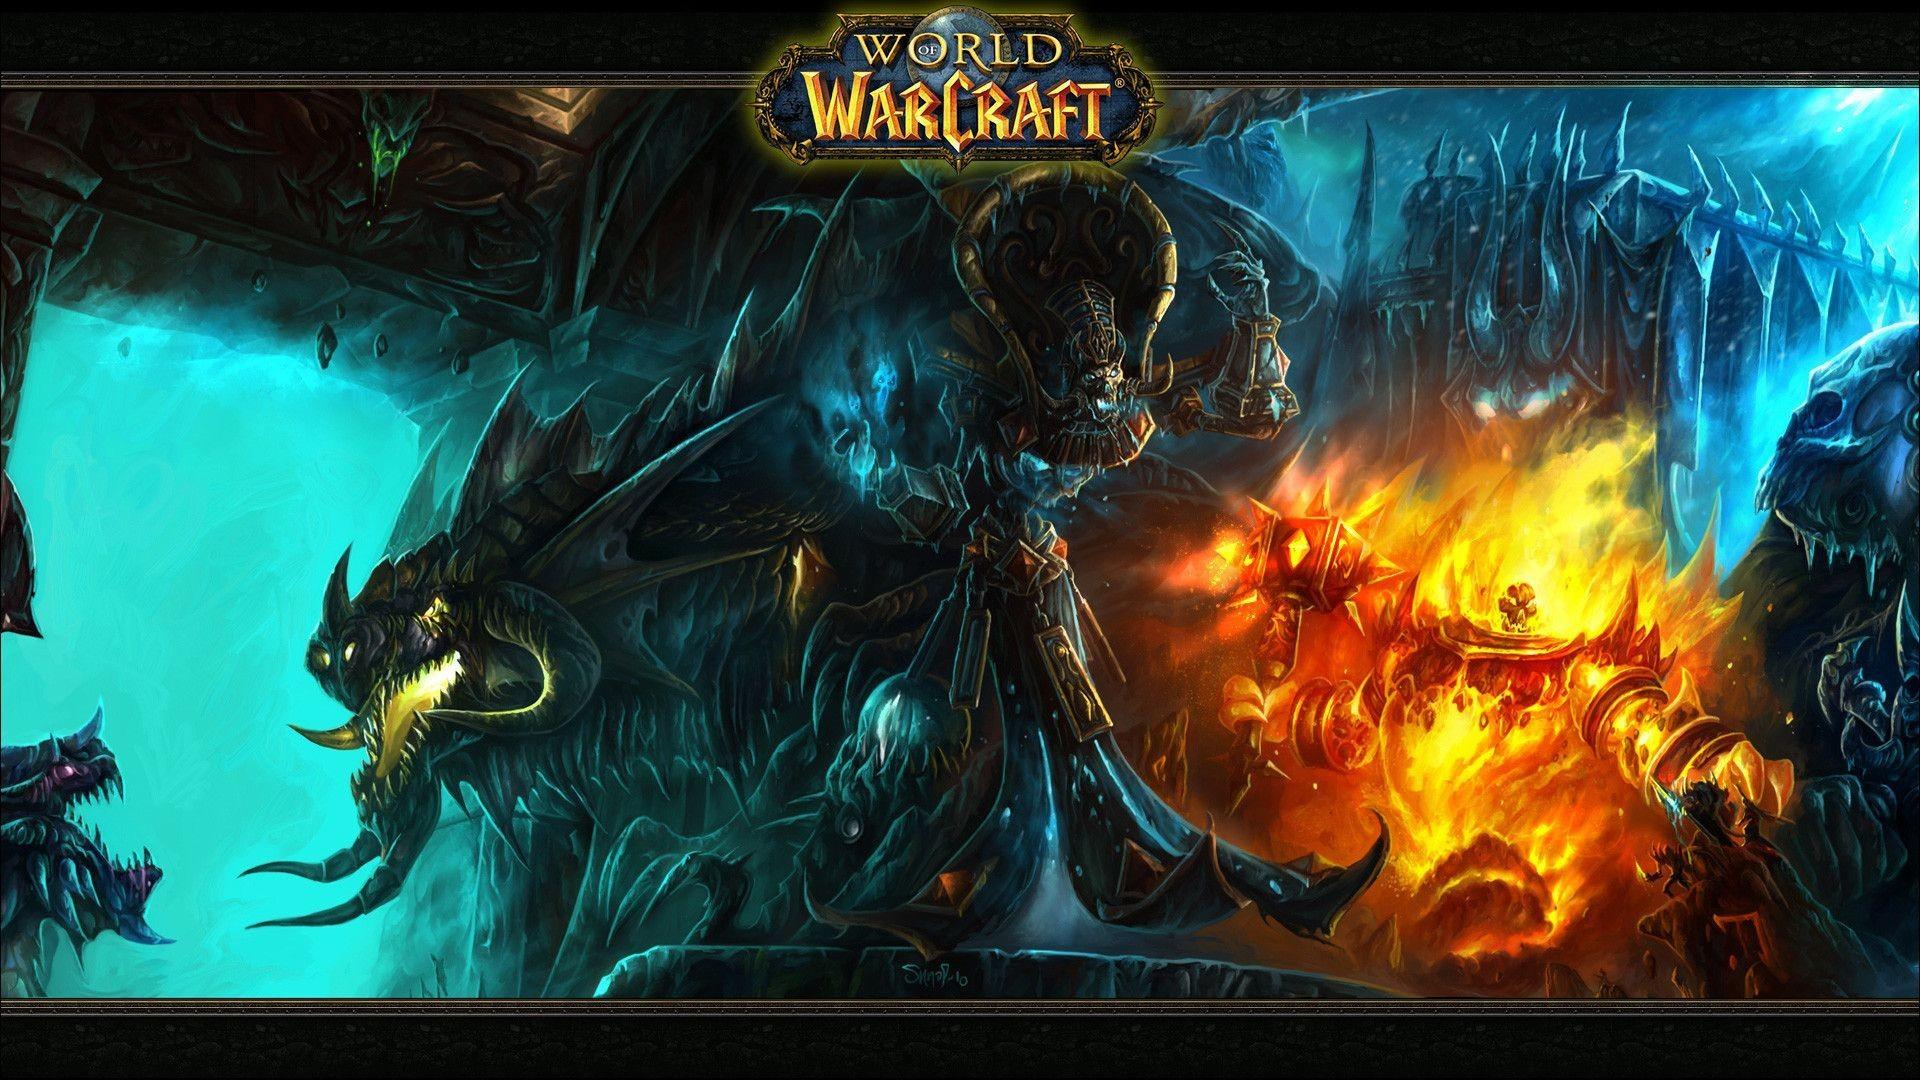 World Of Warcraft Wallpaper Desktop Background ~ Sdeerwallpaper World Of  Warcraft Wallpapers Wallpapers)